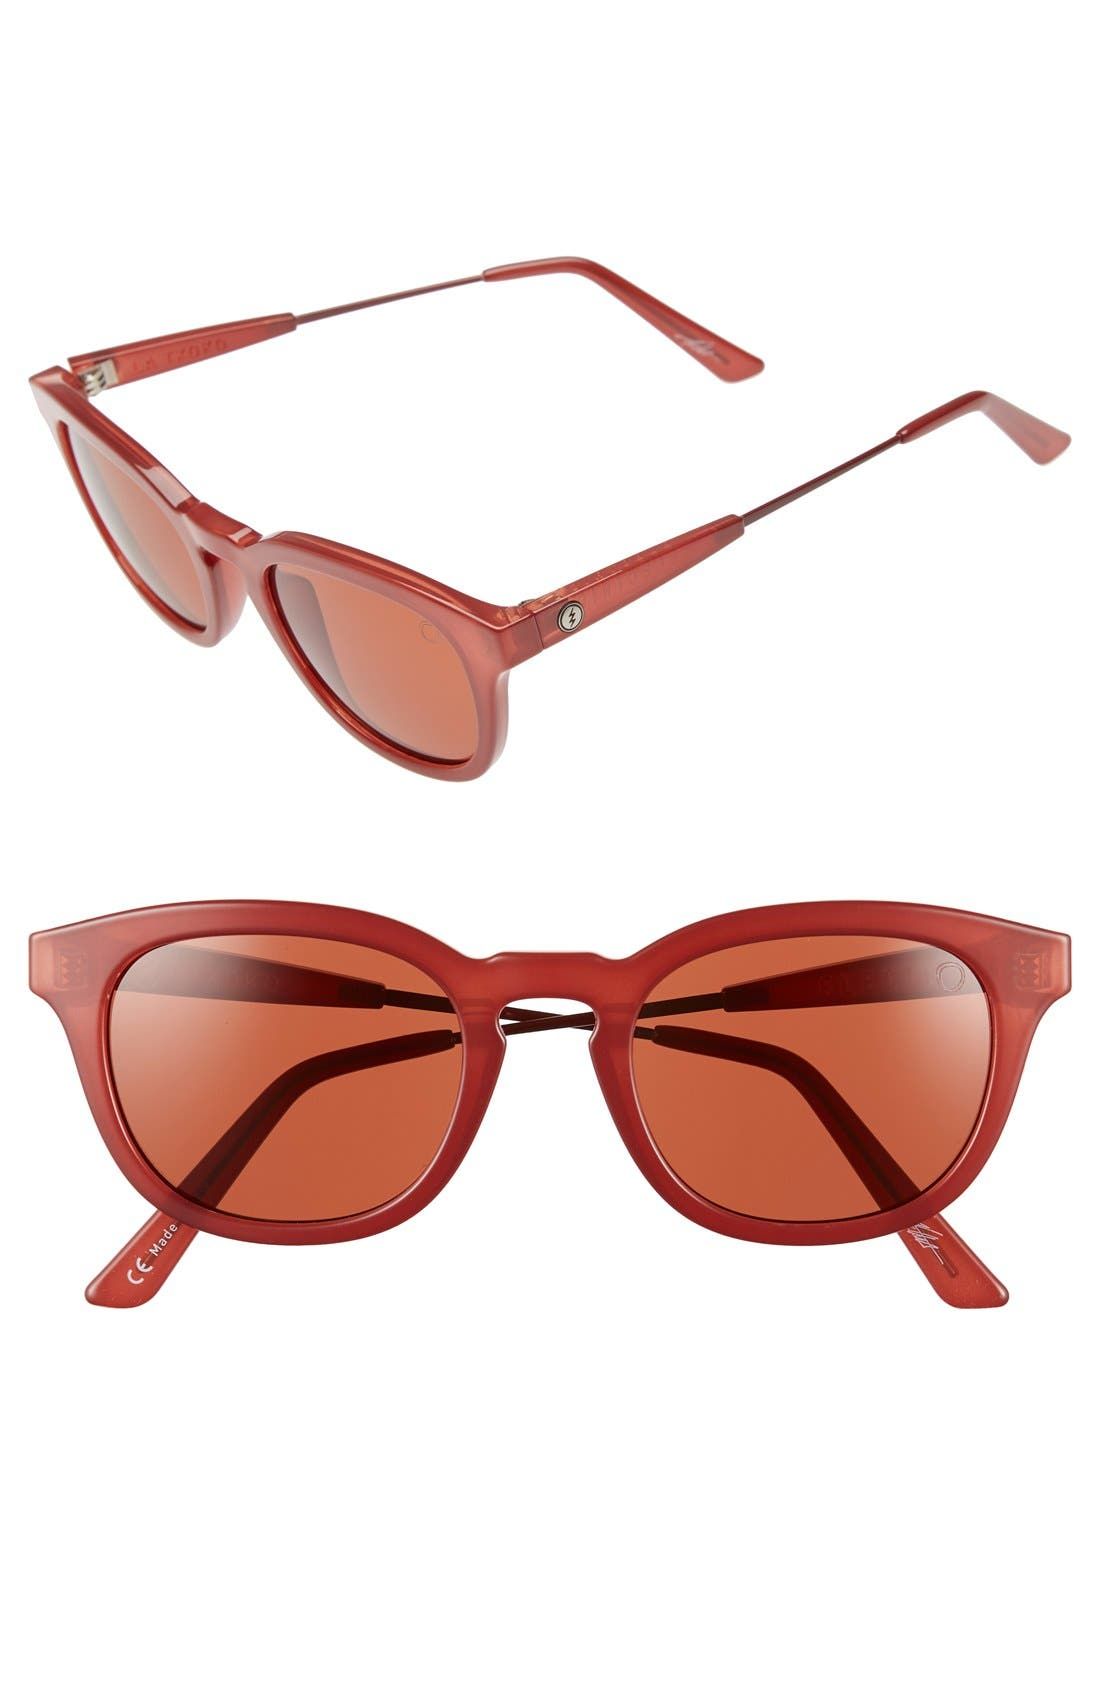 Alternate Image 1 Selected - ELECTRIC 'La Txoko' 51mm Retro Sunglasses